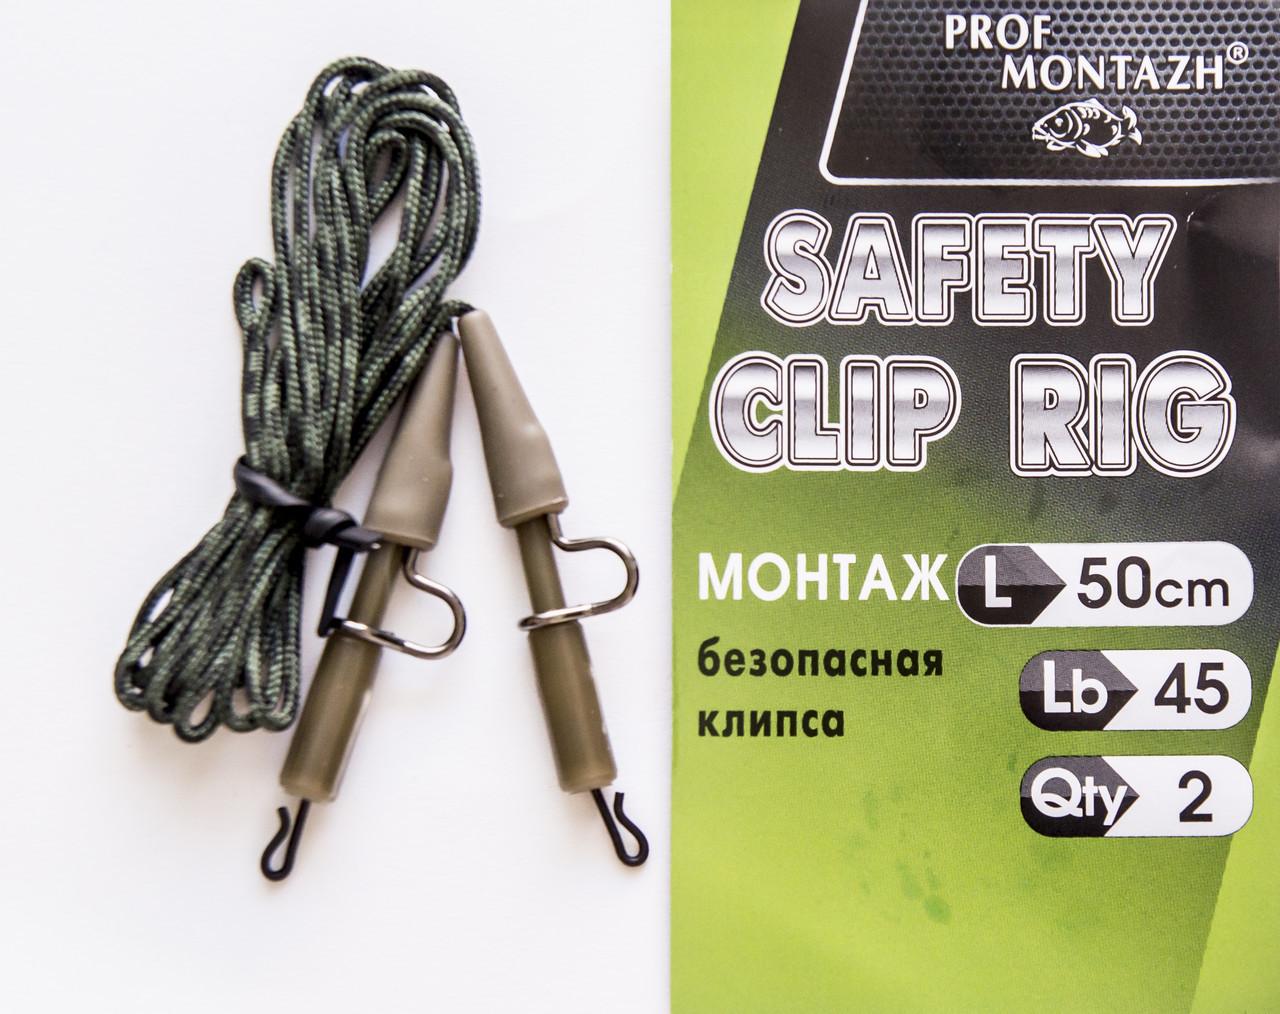 Монтаж безопасная клипса L-50см 45LB 2шт (10шт/уп)